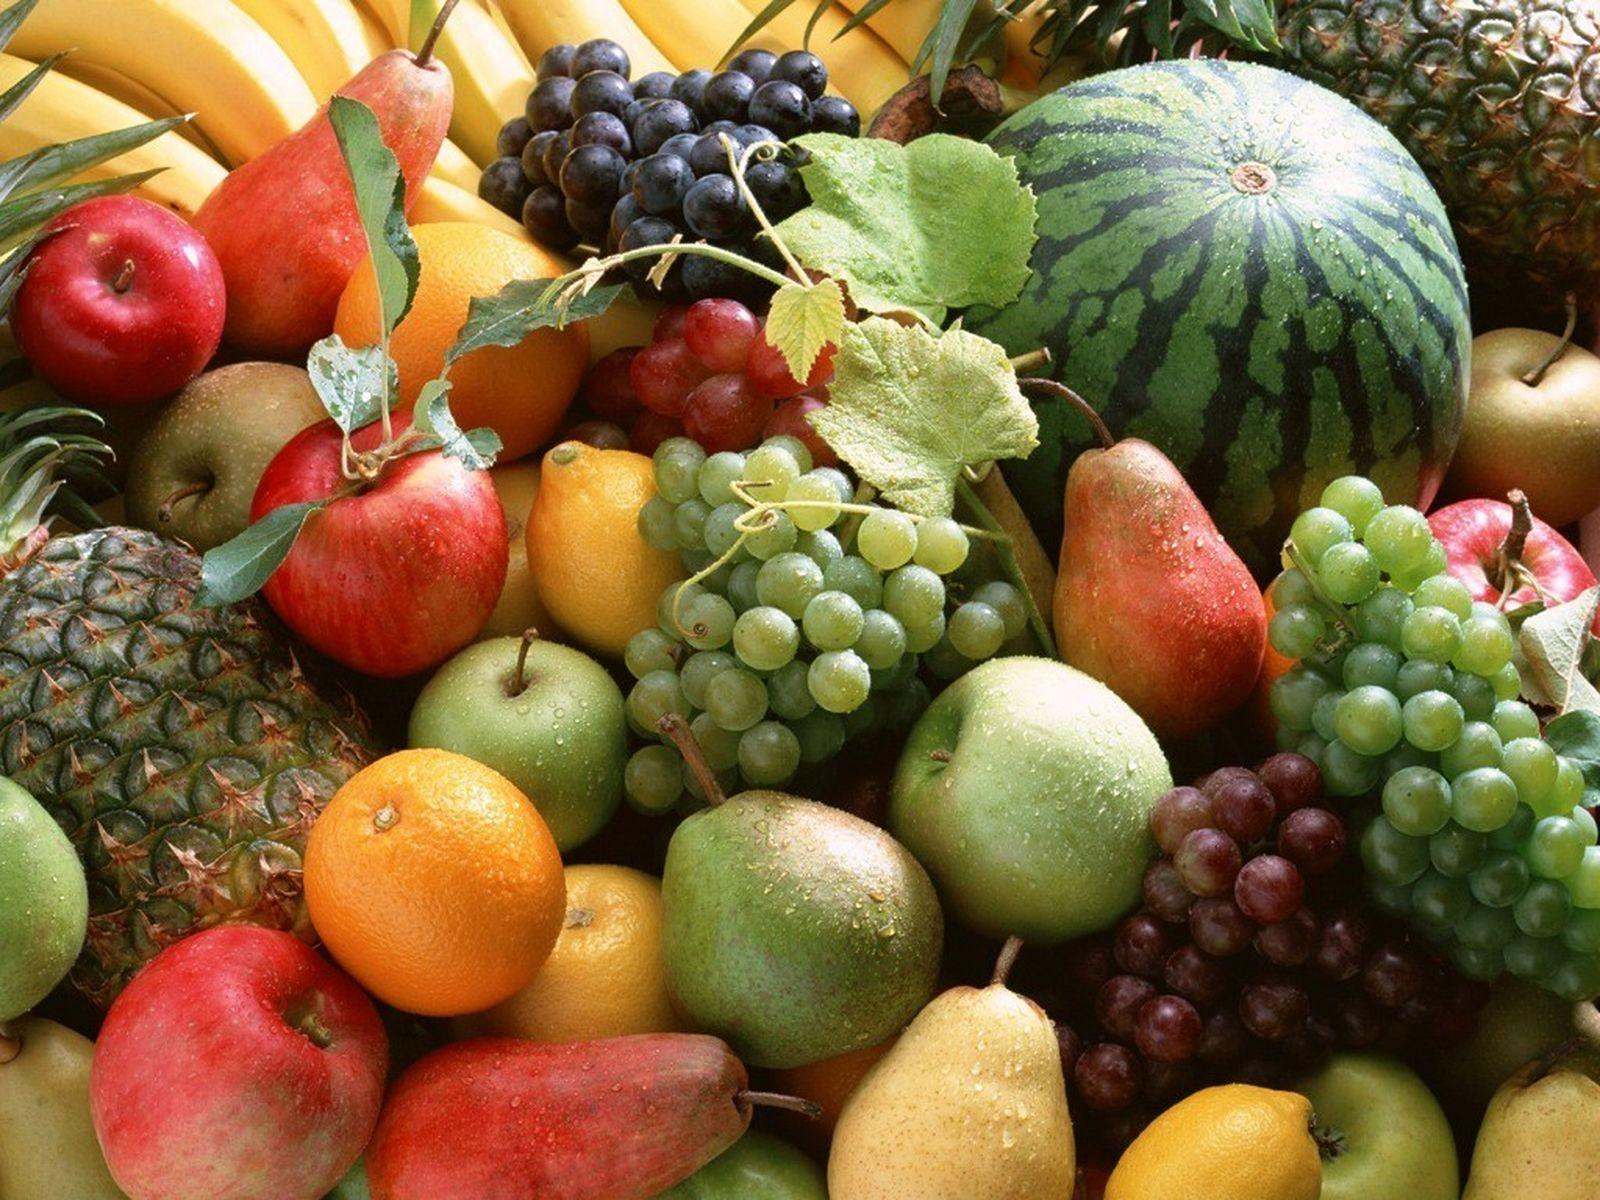 Fruits Wallpapers Album 1 FunJunktion 1600x1200